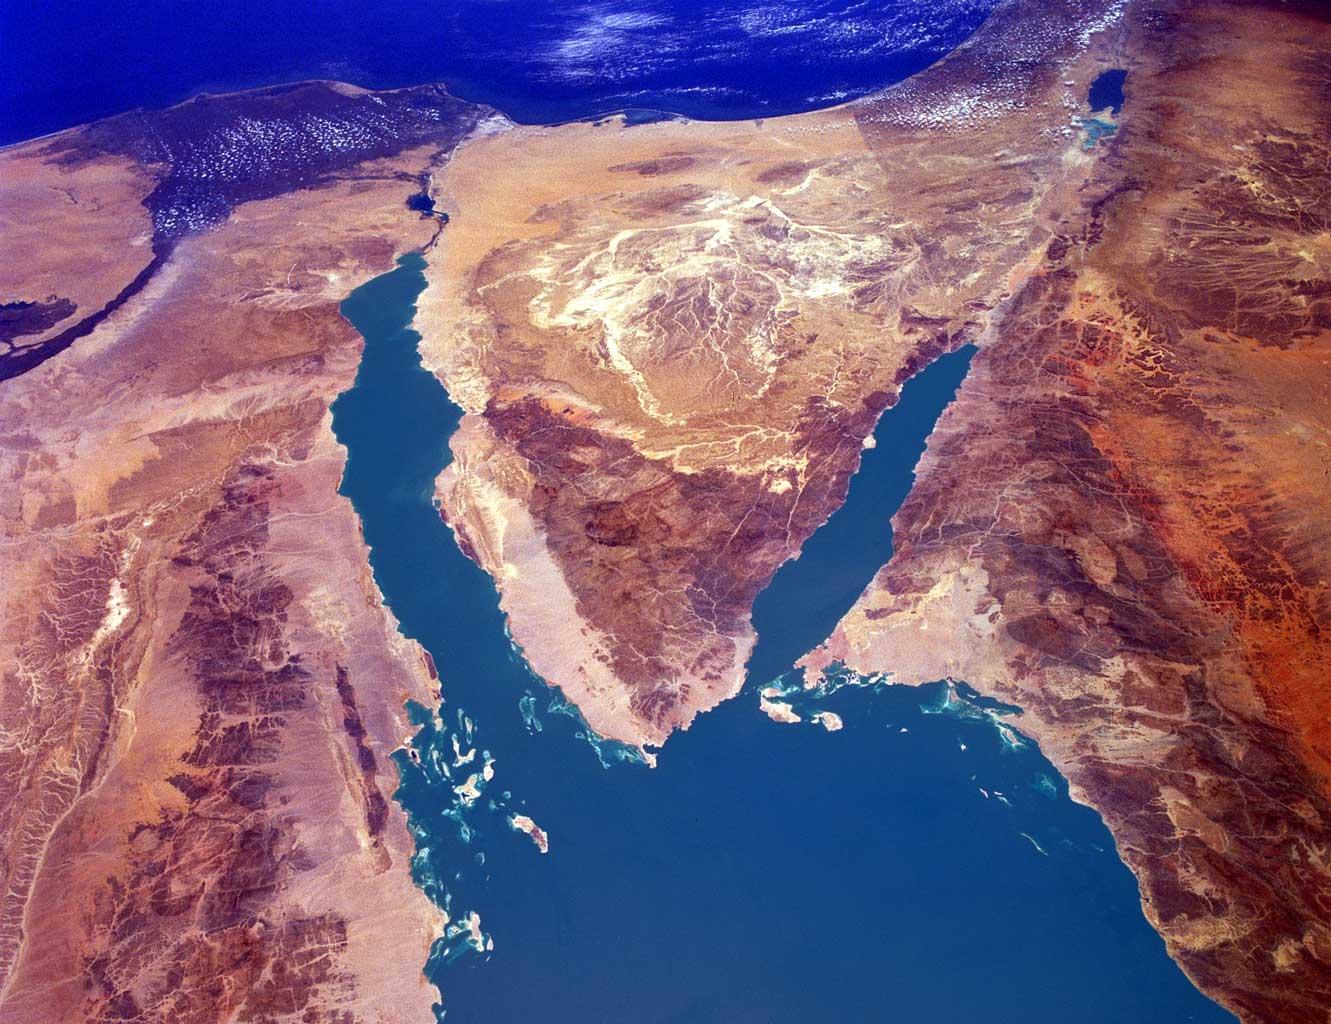 фото ЗакС политика В Ленобласти помянули жертв авиакатастрофы над Синаем